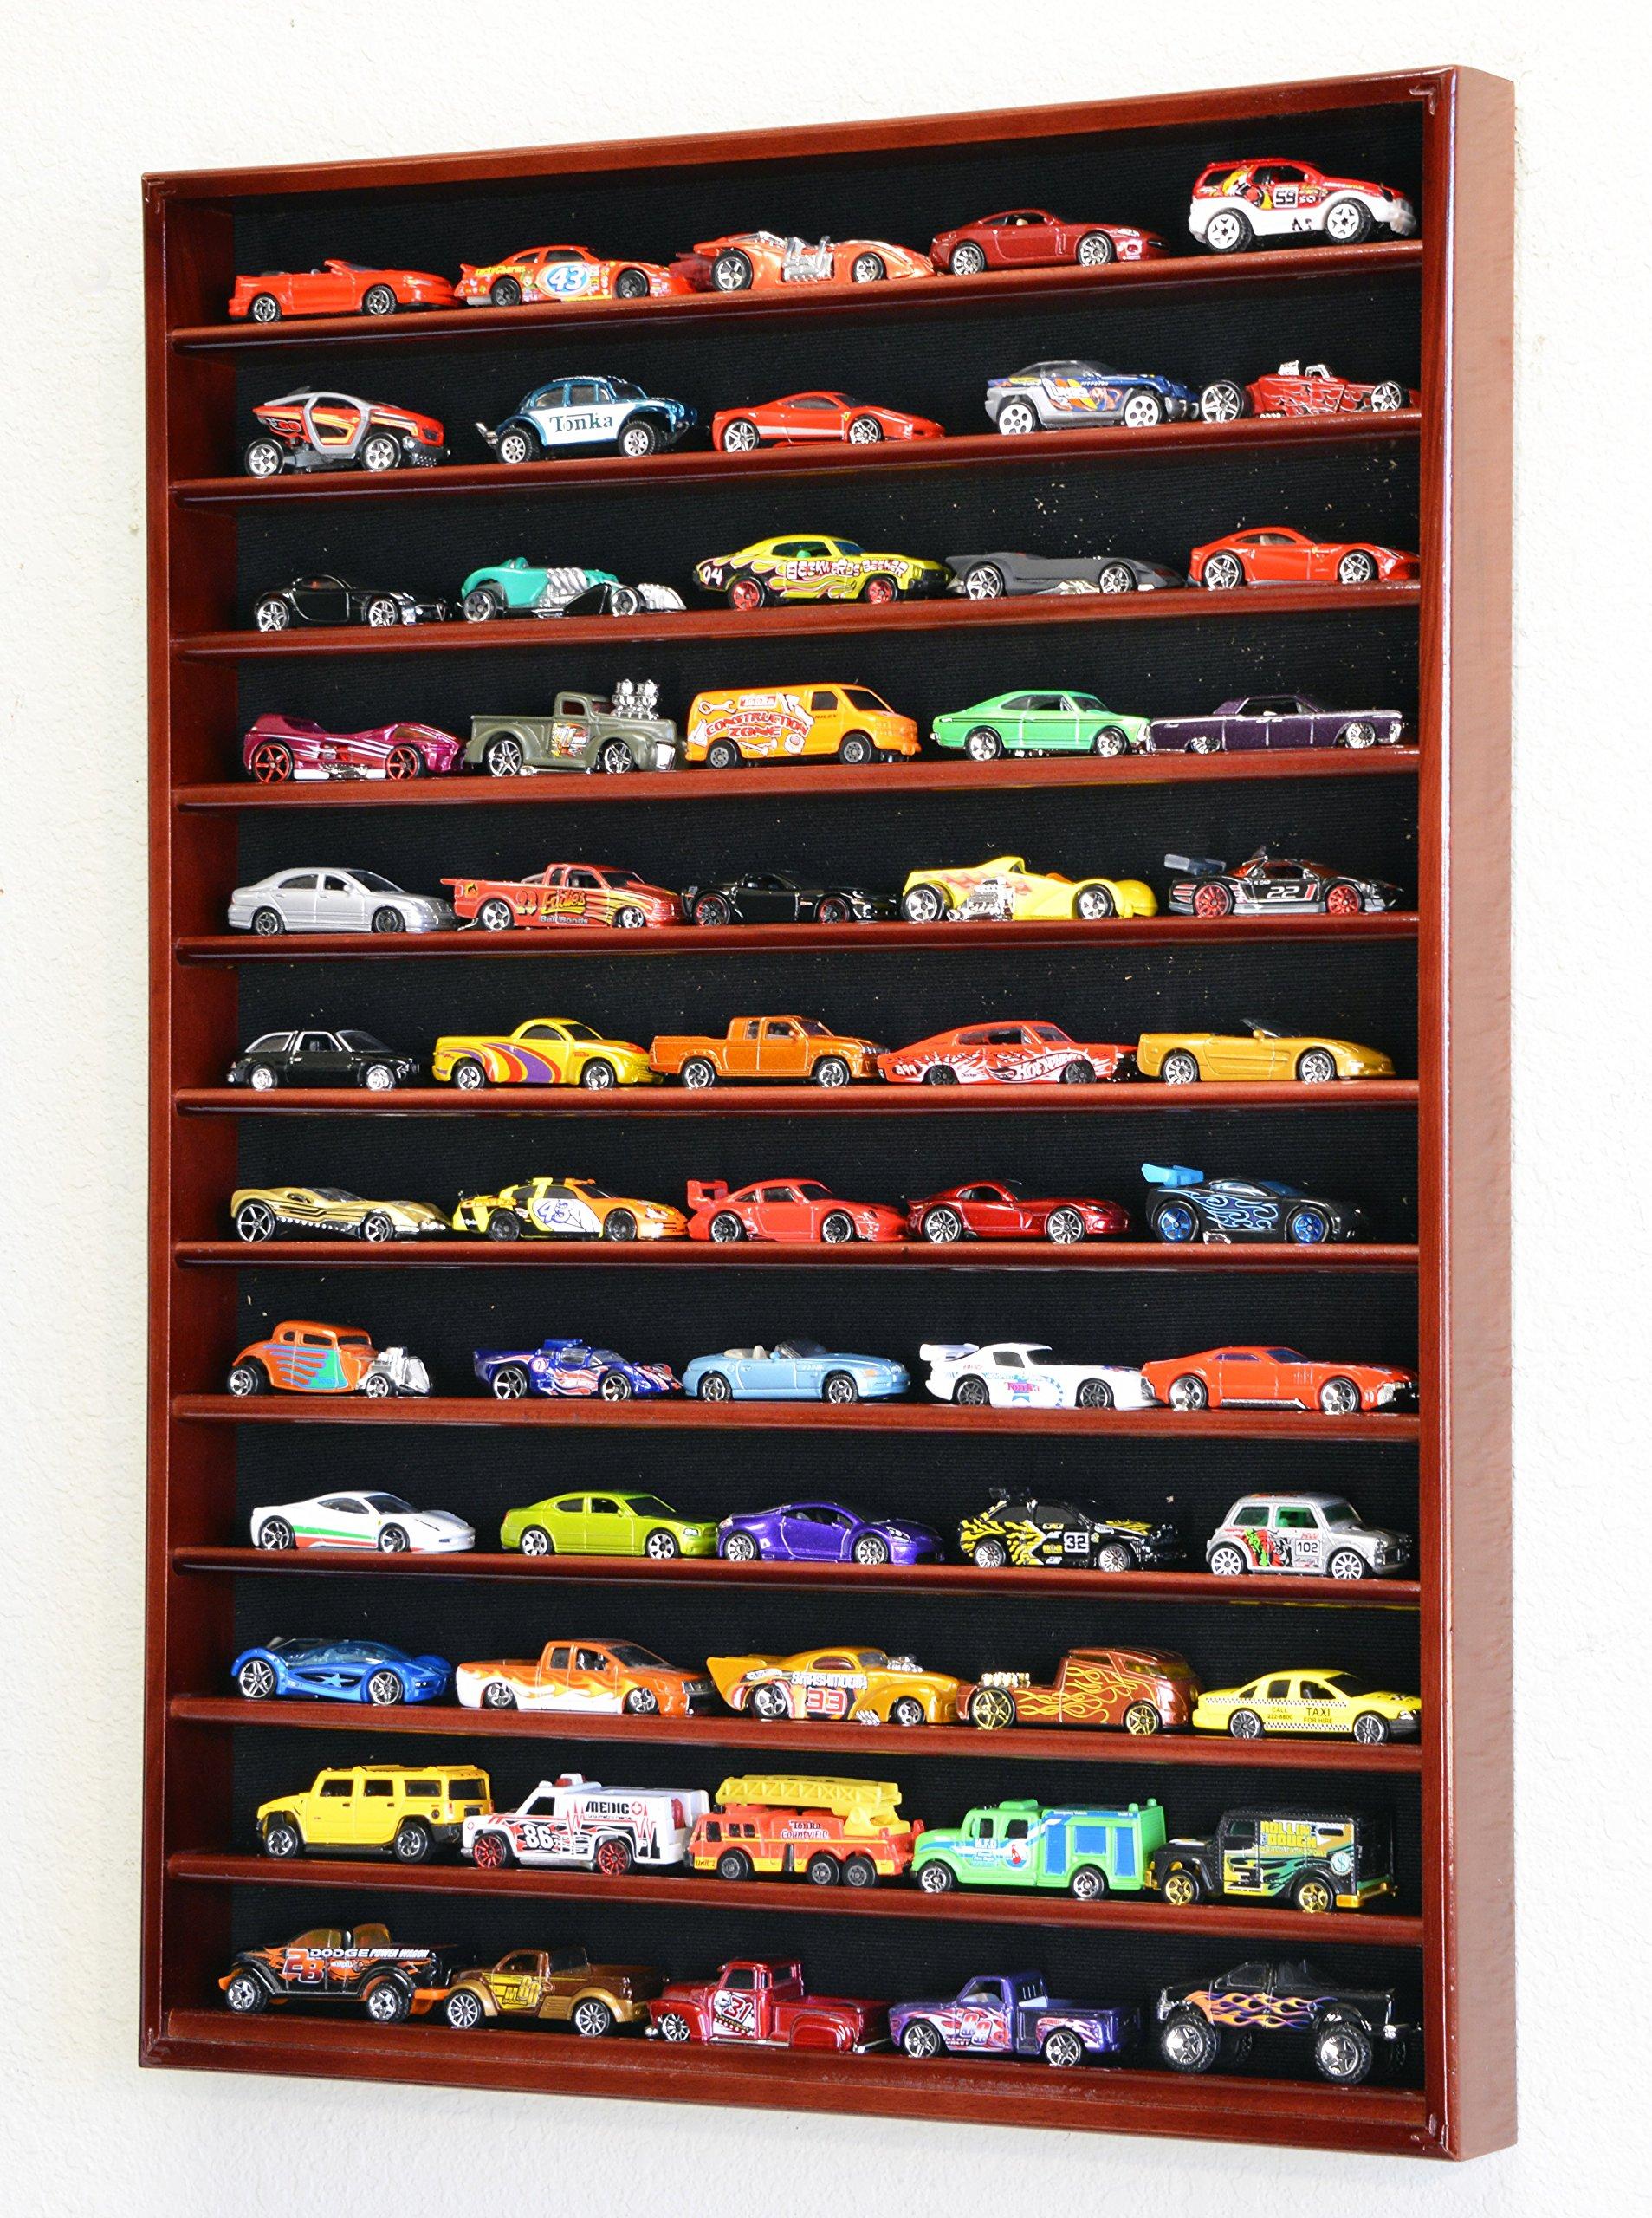 60 Hot Wheels Hotwheels Matchbox 1/64 Scale Diecast Model Cars Display Case - NO DOOR (Cherry Wood Finish)